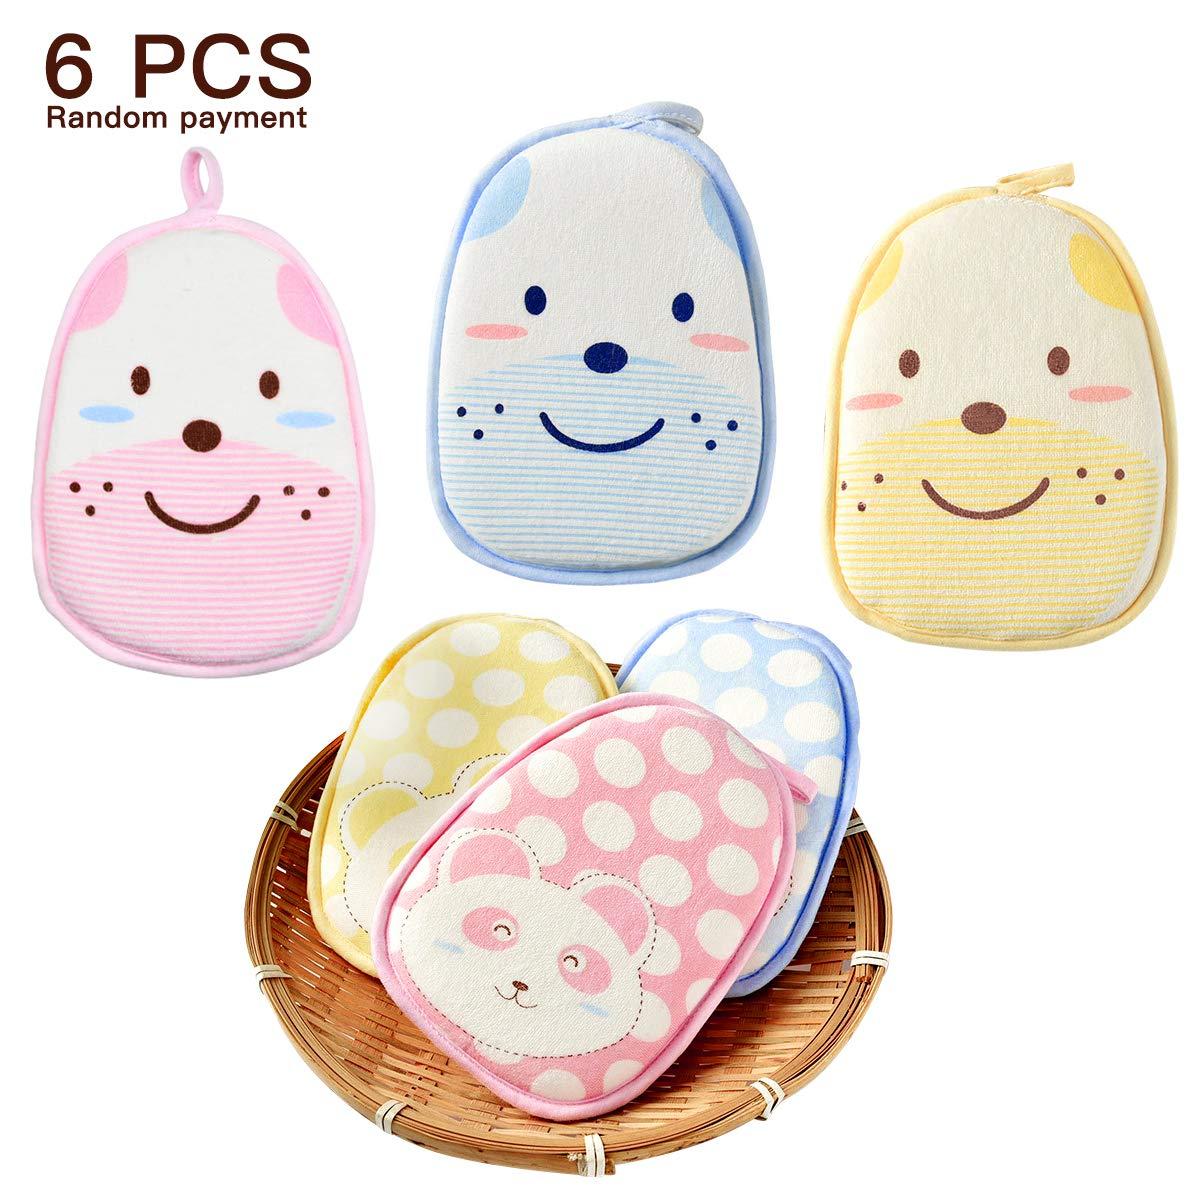 Cartoon Soft Baby Bath Sponge Pack of 2; Premium Natural Foam Sponge for Kids and Toddlers coffled iek900016mayeightzhA